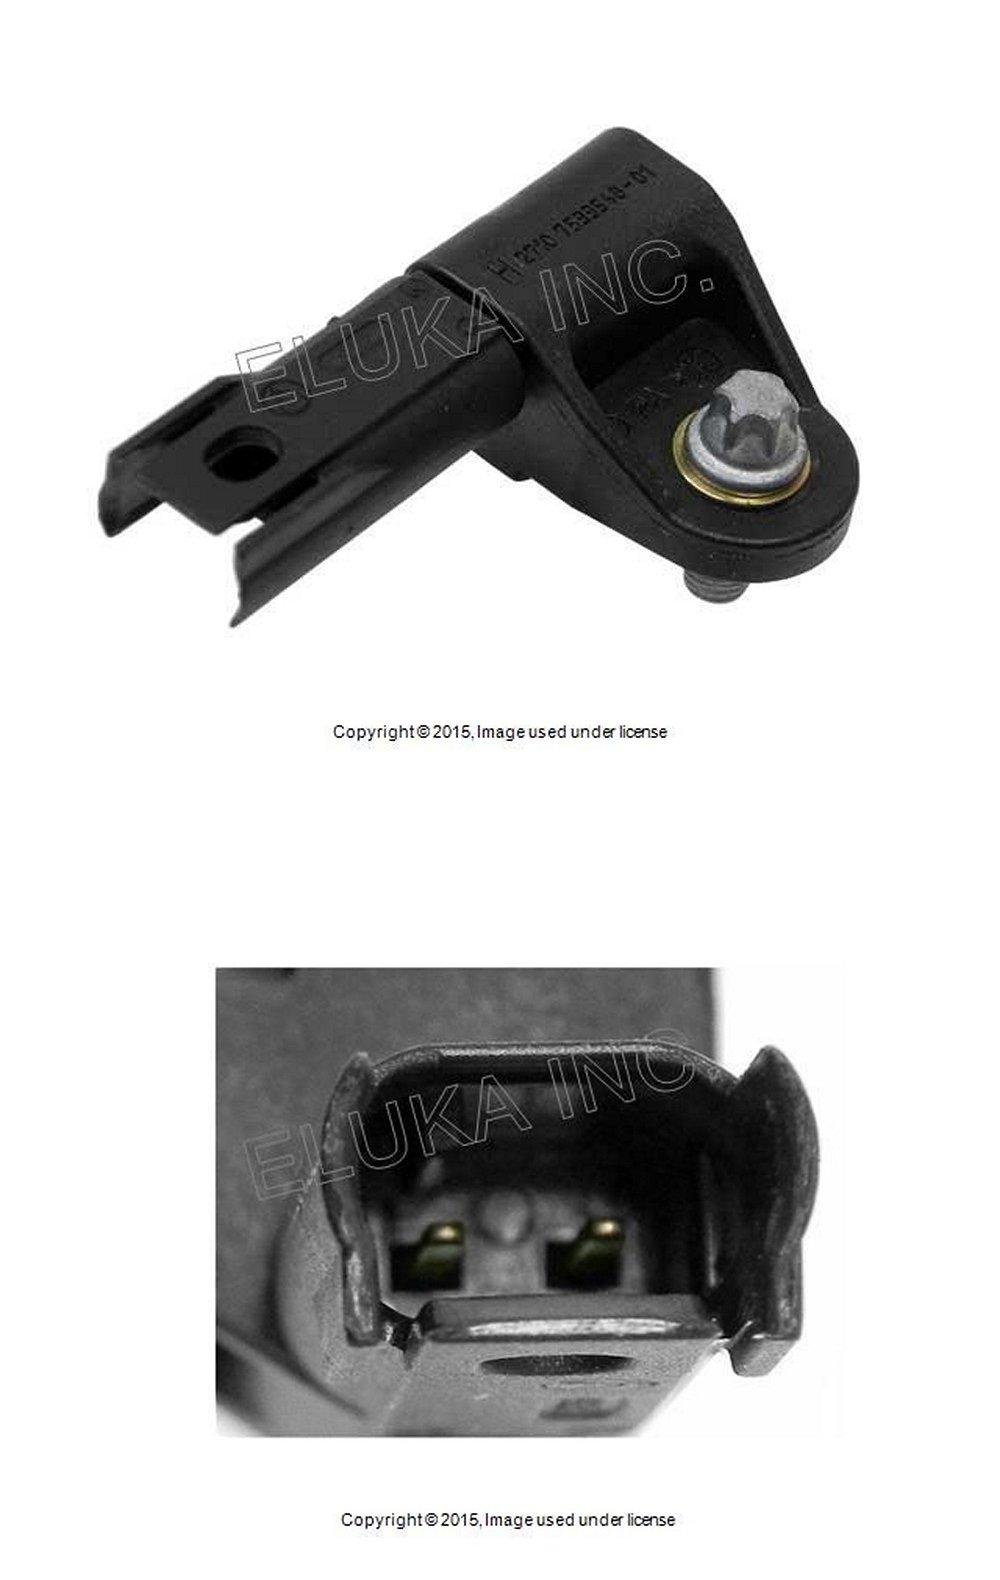 BMW Genuine Resistor For Transfer Case Motor (Actuator) X5 3.0i X5 4.4i X5 4.8is 525xi 530xi 528xi 535xi 530xi 535xi X3 2.5i X3 3.0i X3 3.0i X3 3.0si 325xi 328xi 330xi 335xi 328xi 335xi 325xi 328xi 328xi 328xi 335xi 328xi 335xi